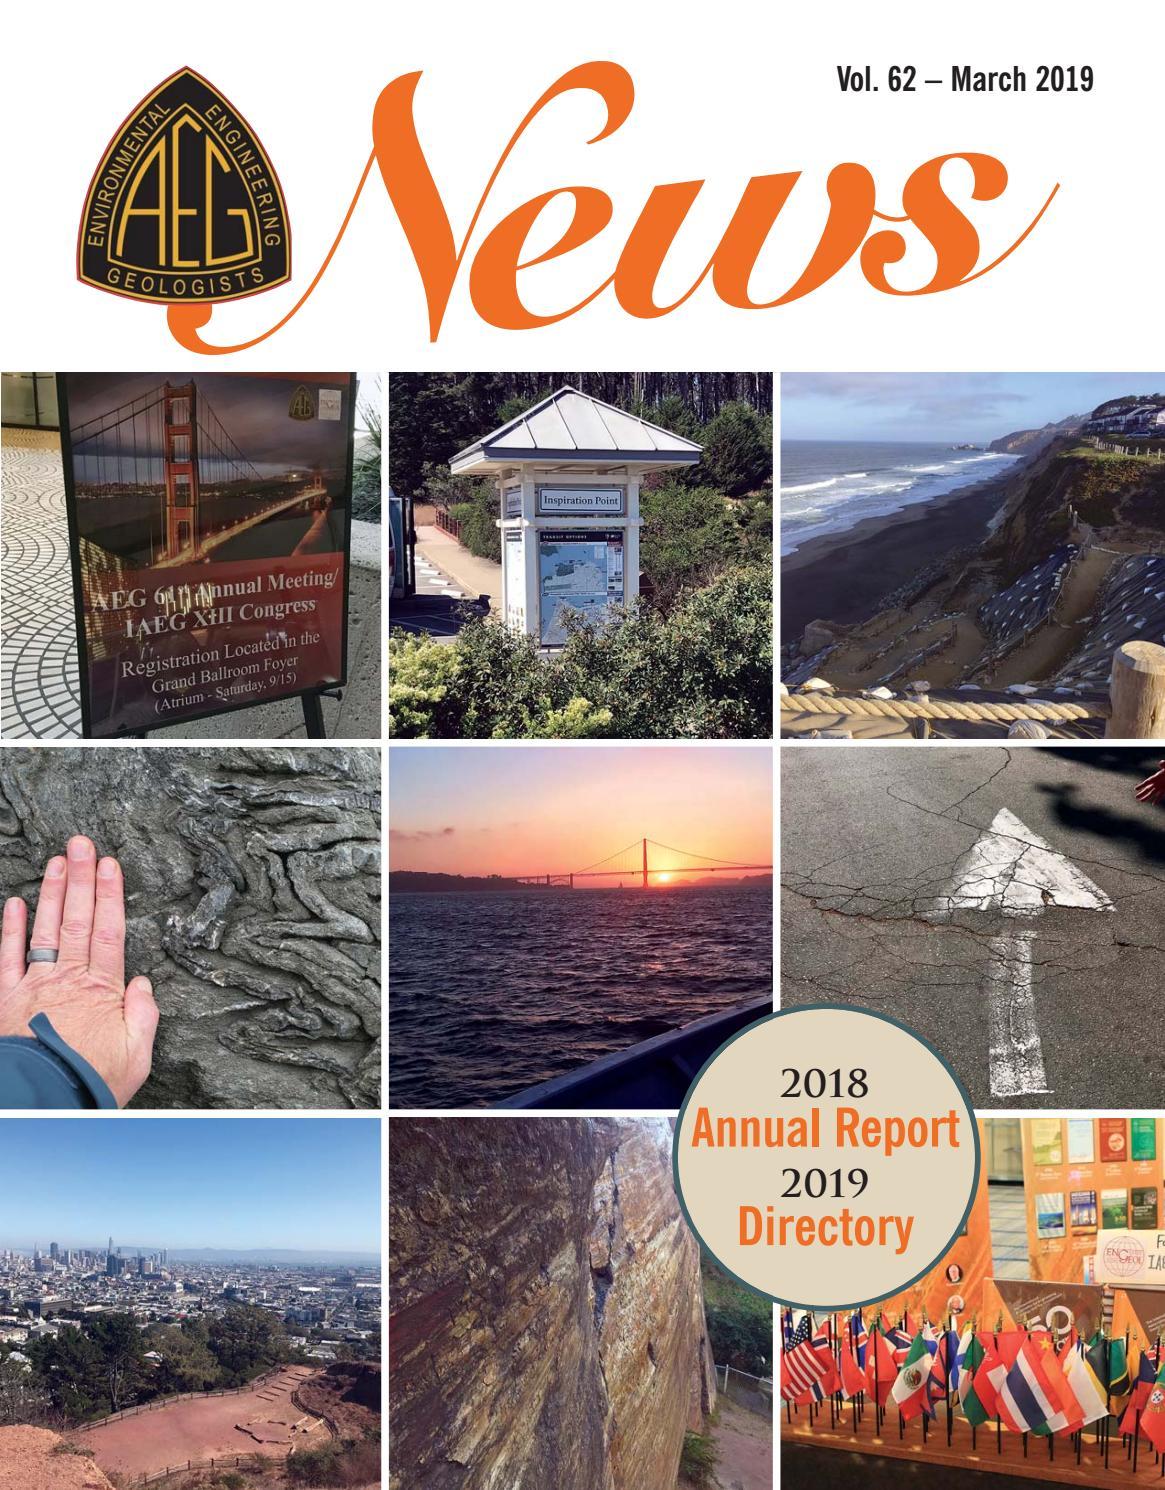 aeg 2018 annual report \u0026 2019 directory by association of